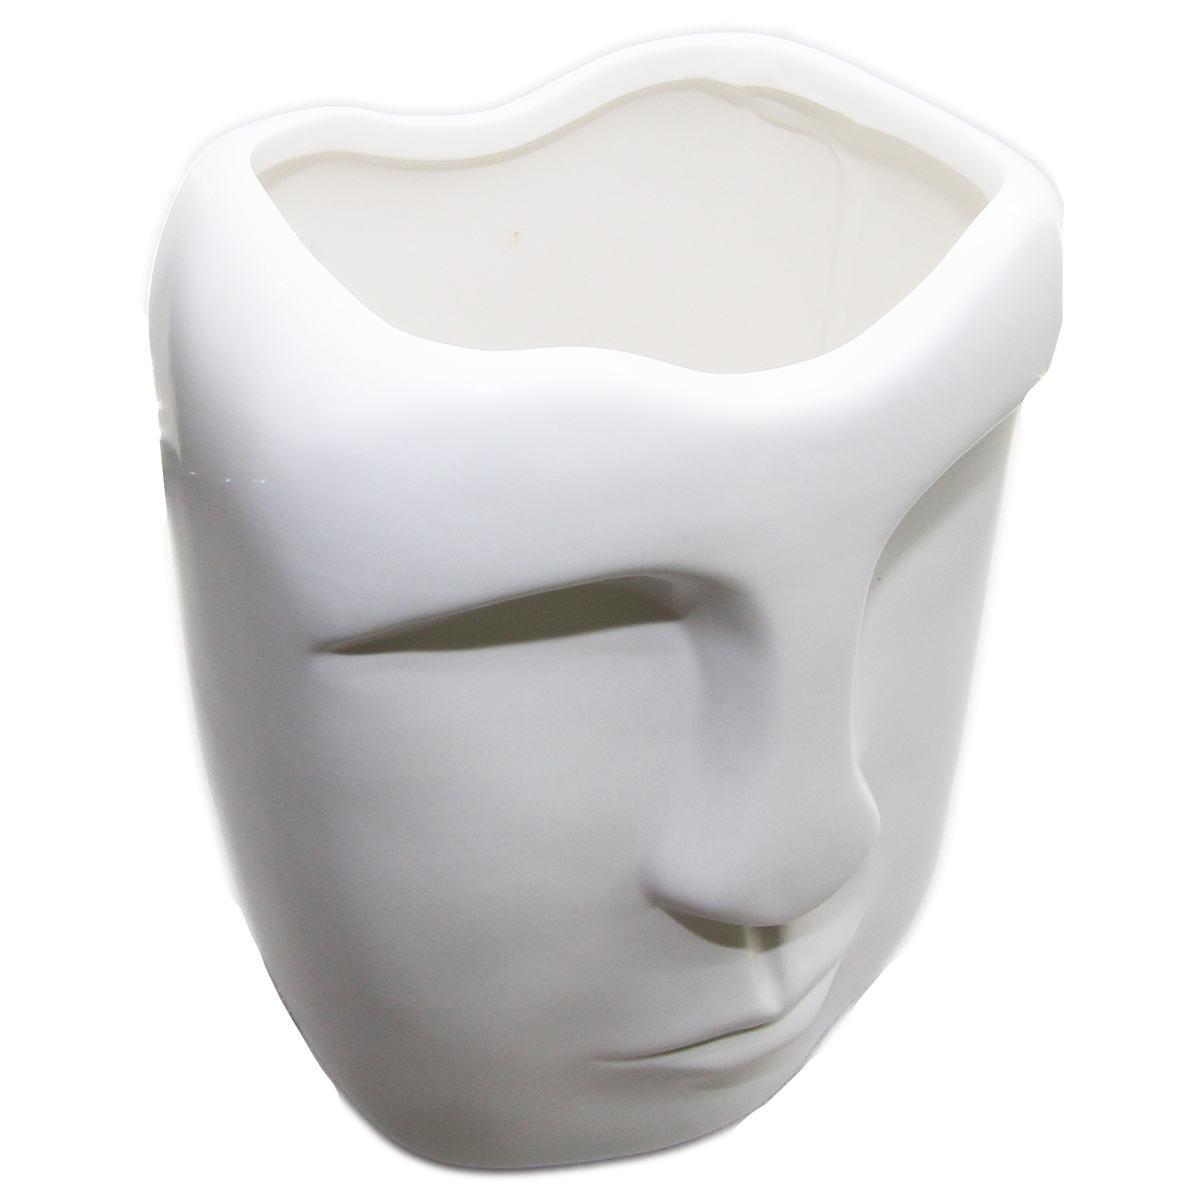 Vaso cerâmica branca Rosto 14x12x19cm BTC